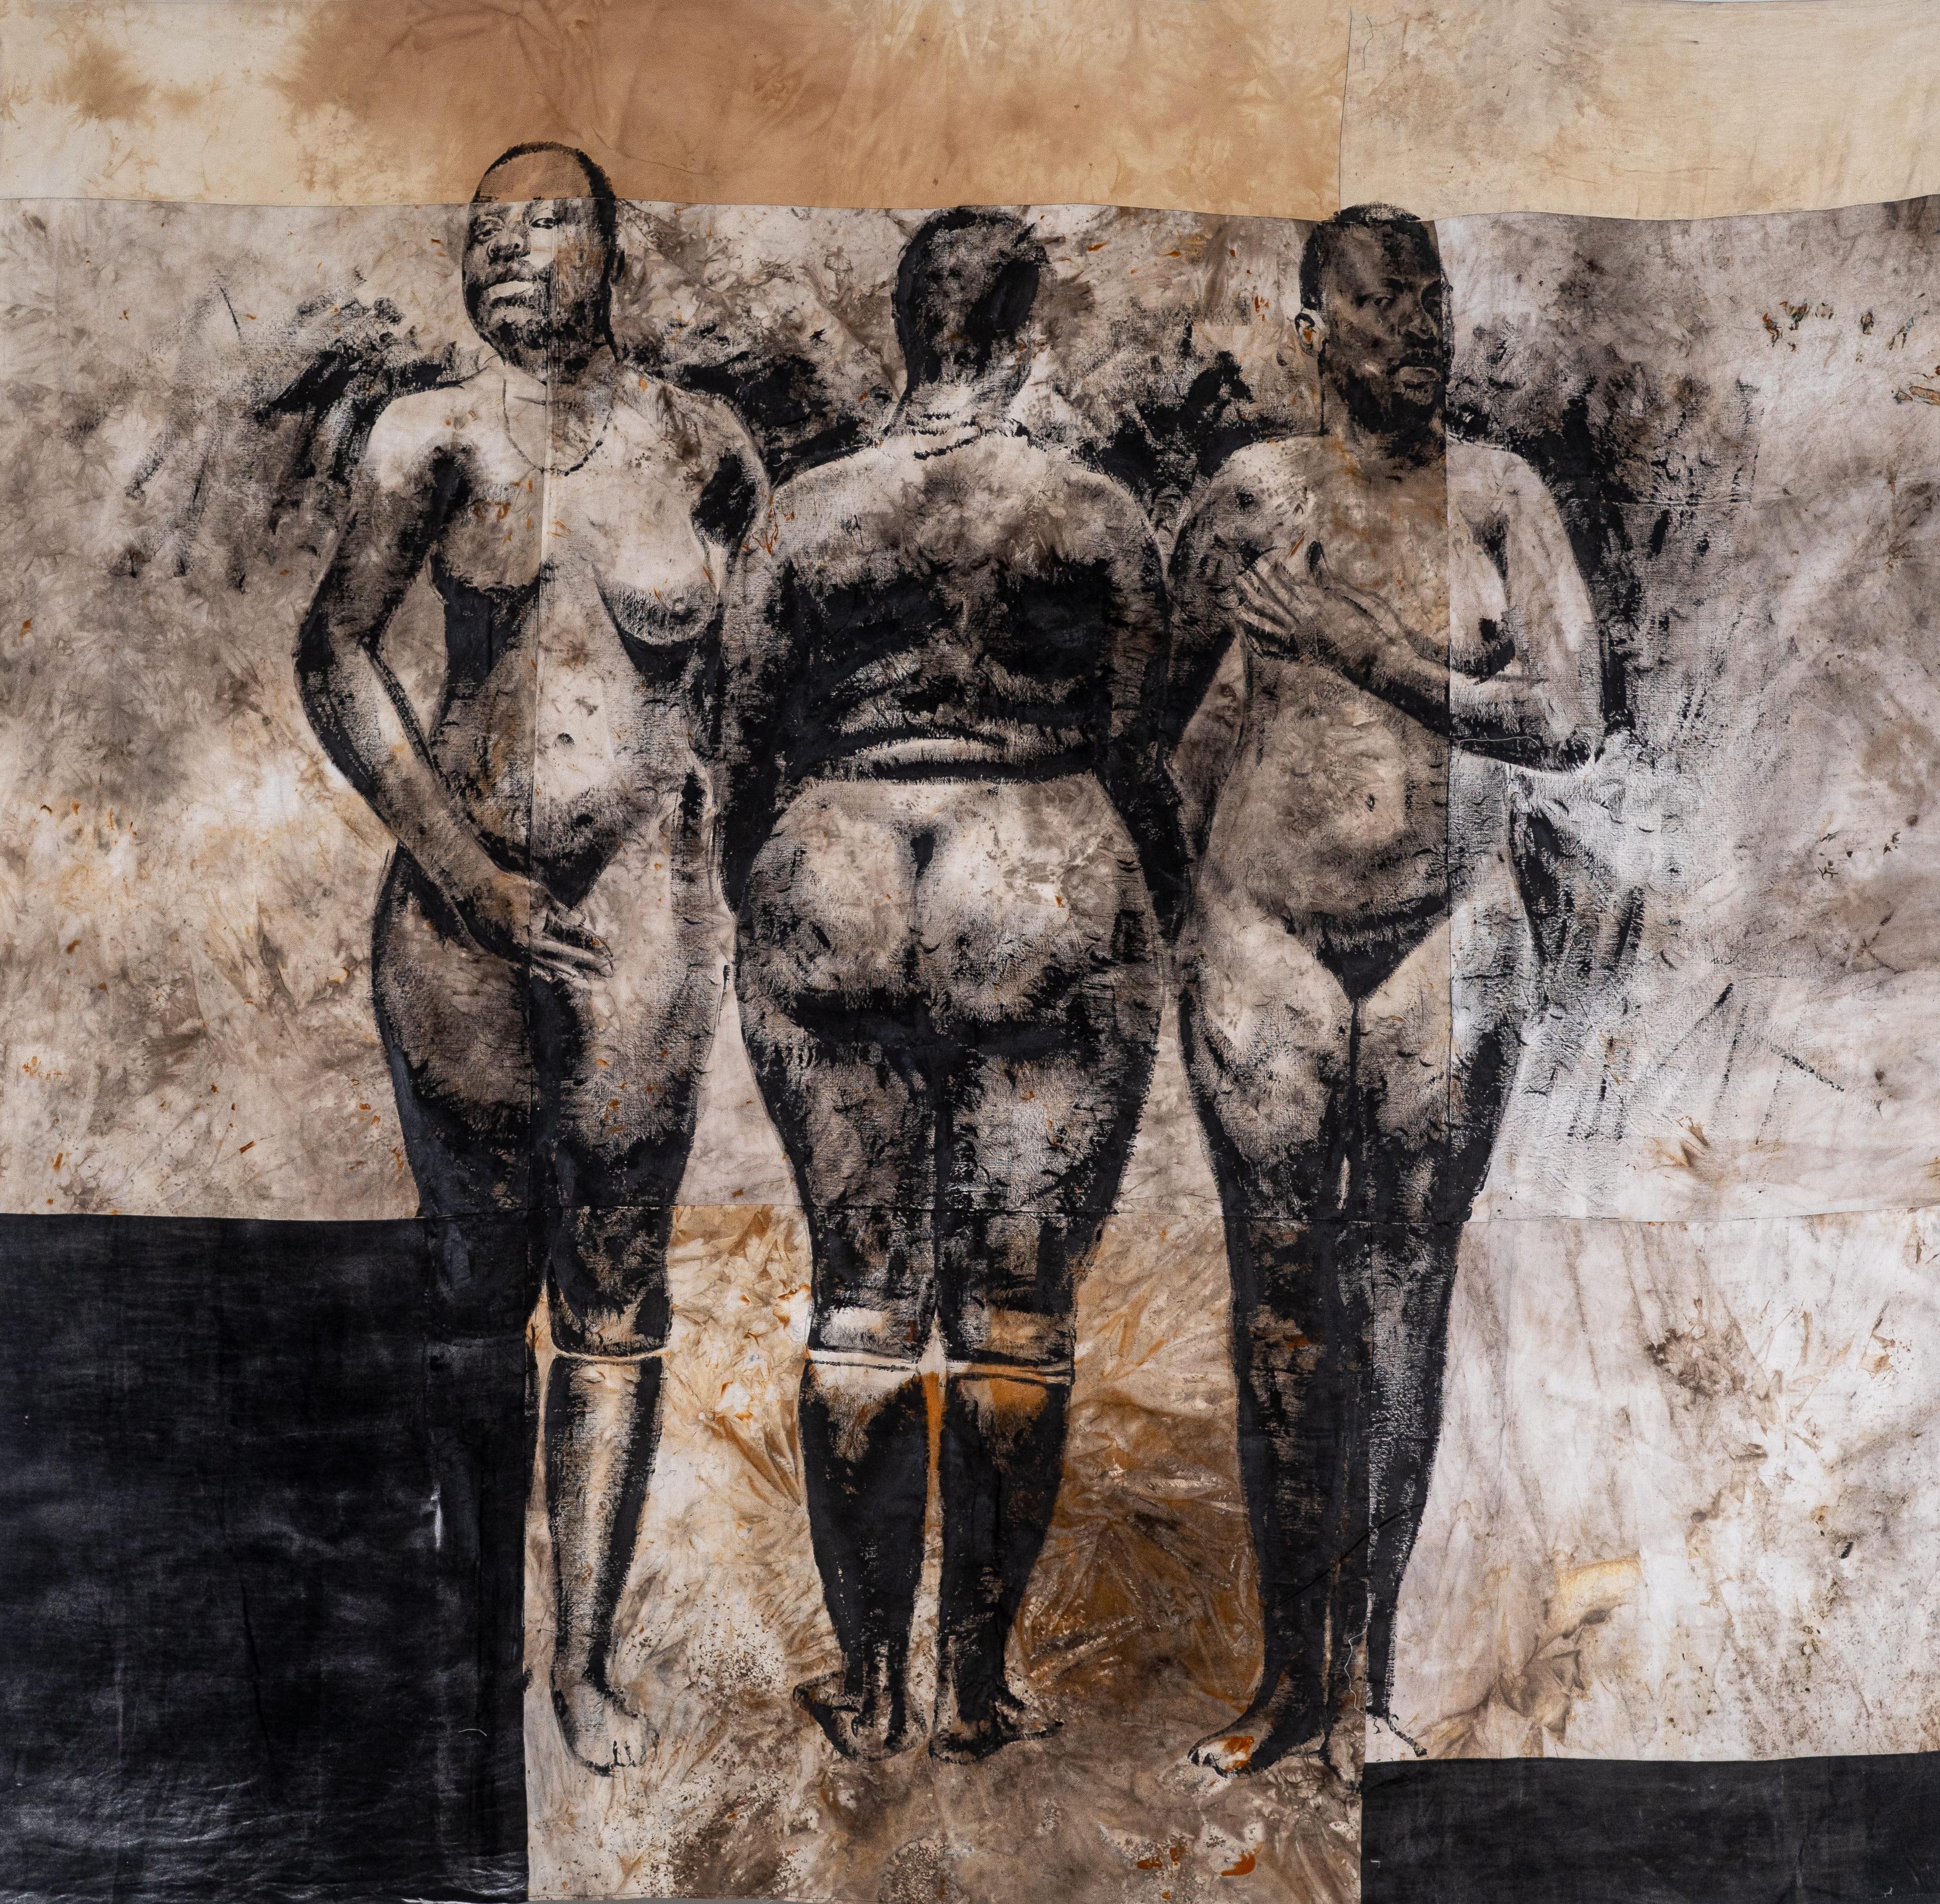 Galerie_Fakhoury - 13-09-2020 - HD - JPG (sRVB) (12 of 31)